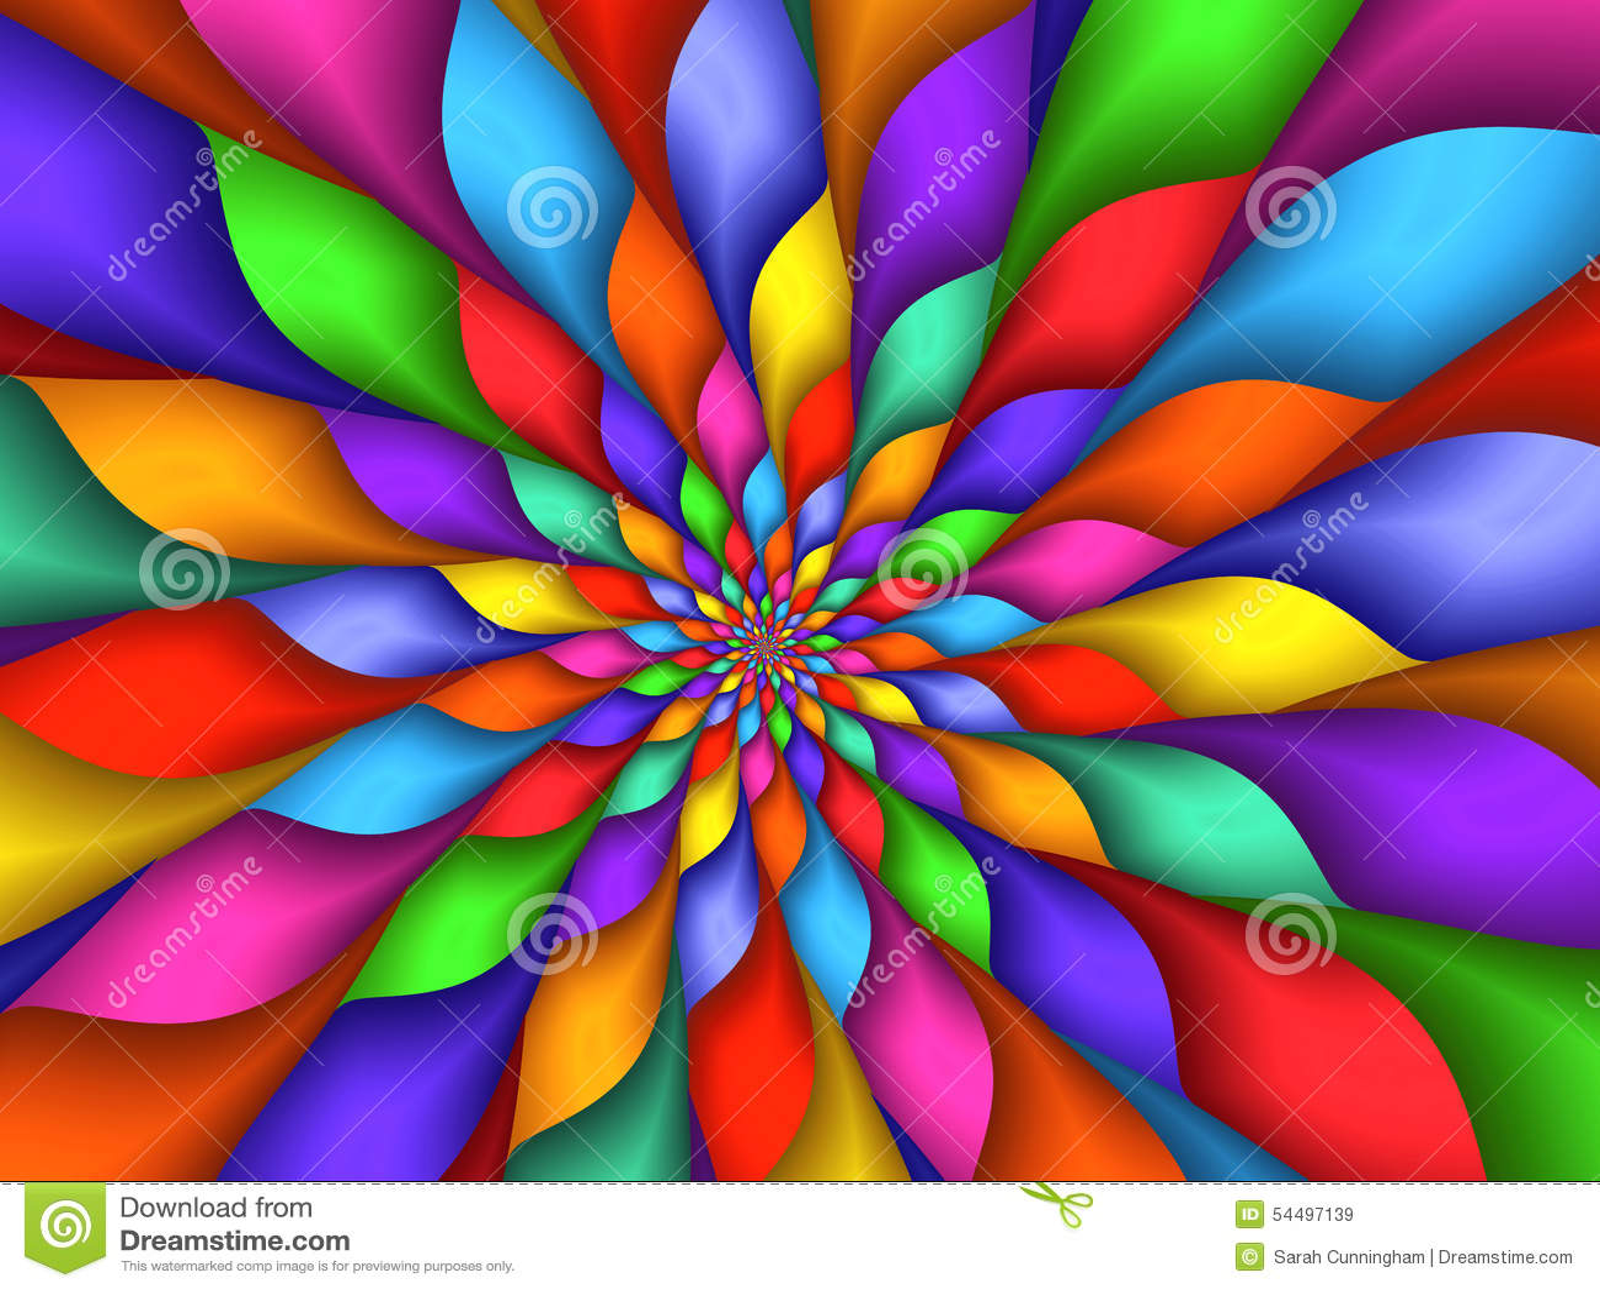 Digital Art Abstract Rainbow Petals Spiral Background